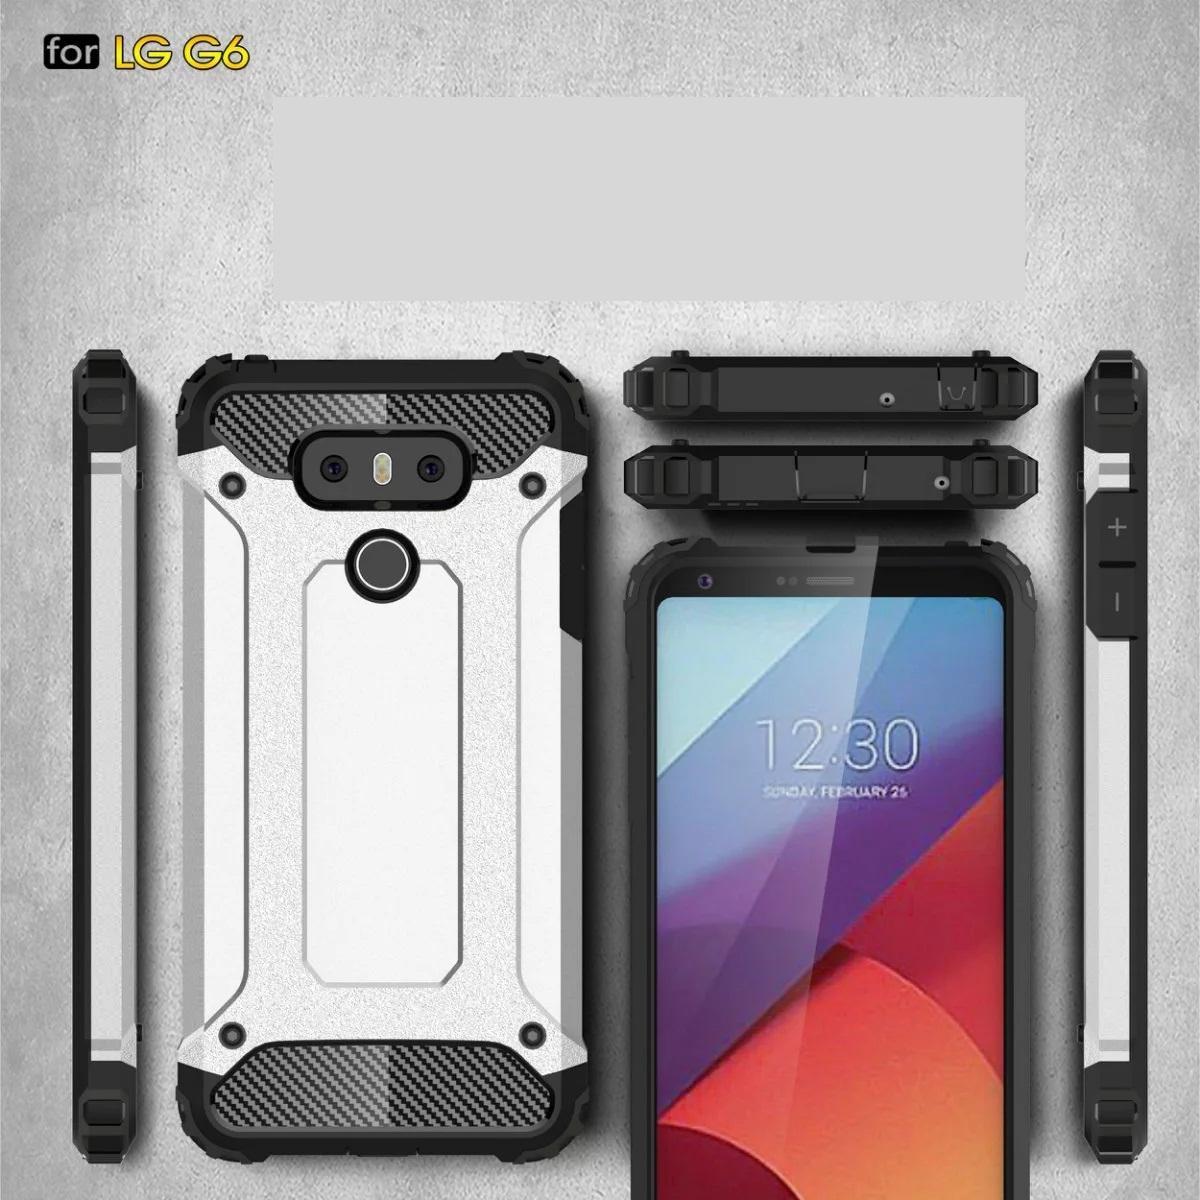 Armor Hybrid Defender Case TPU+PC Shockproof Cover Case FOR LG G6 G5 Q6 Galaxy S7 EDGE S7 PLUS S6 EDGE PLUS